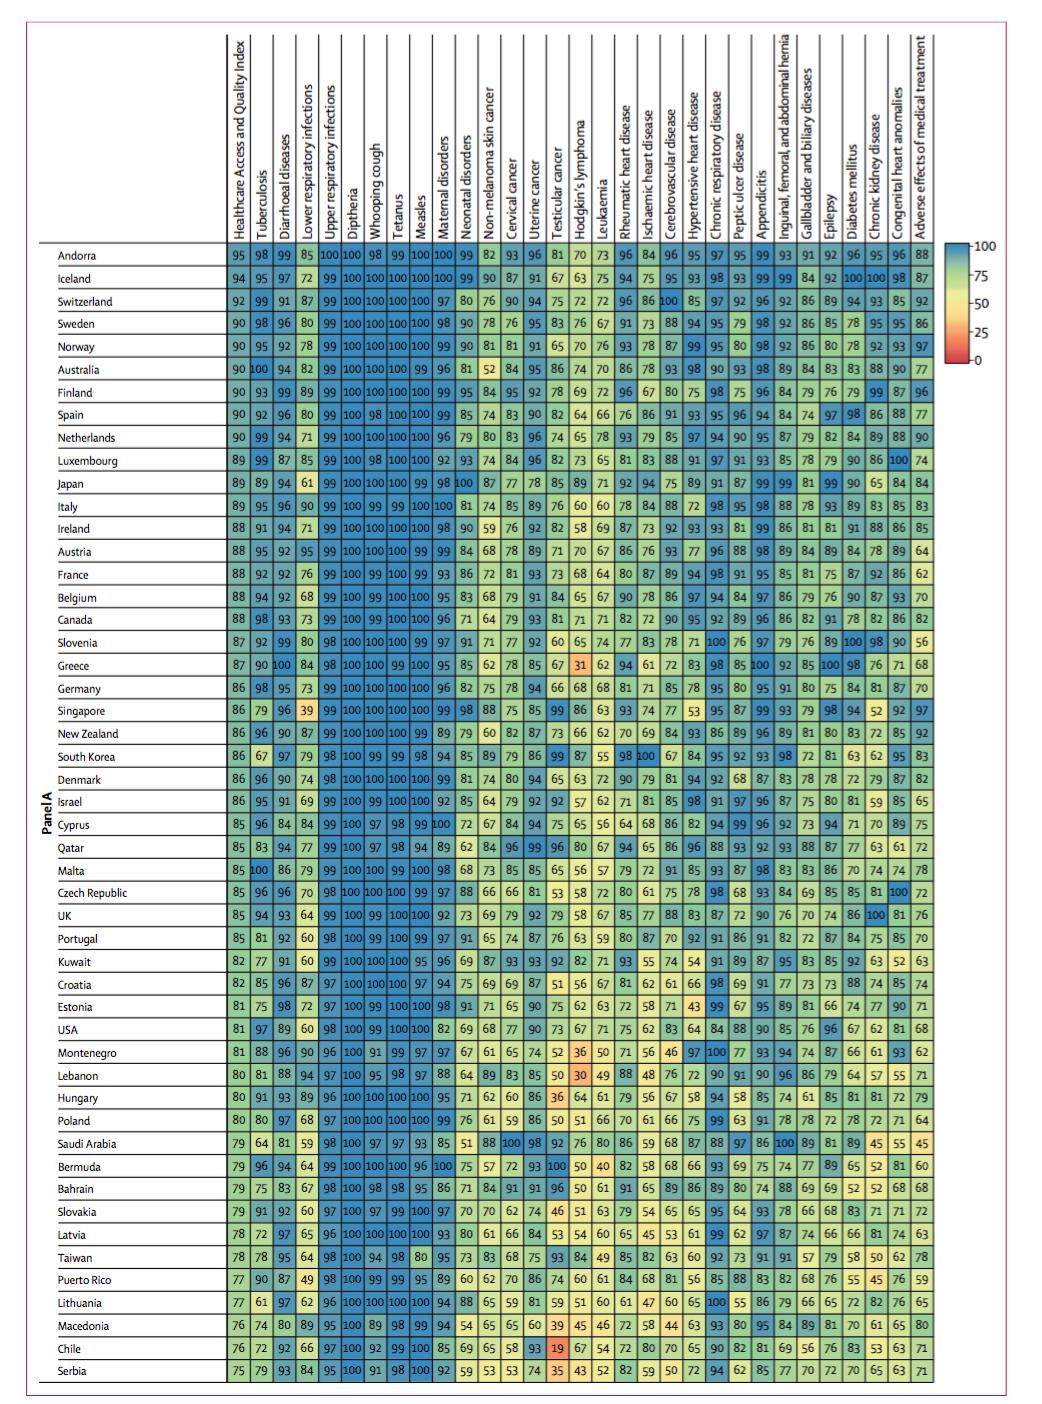 The-Lancet-Indice-Sanidad-2.png